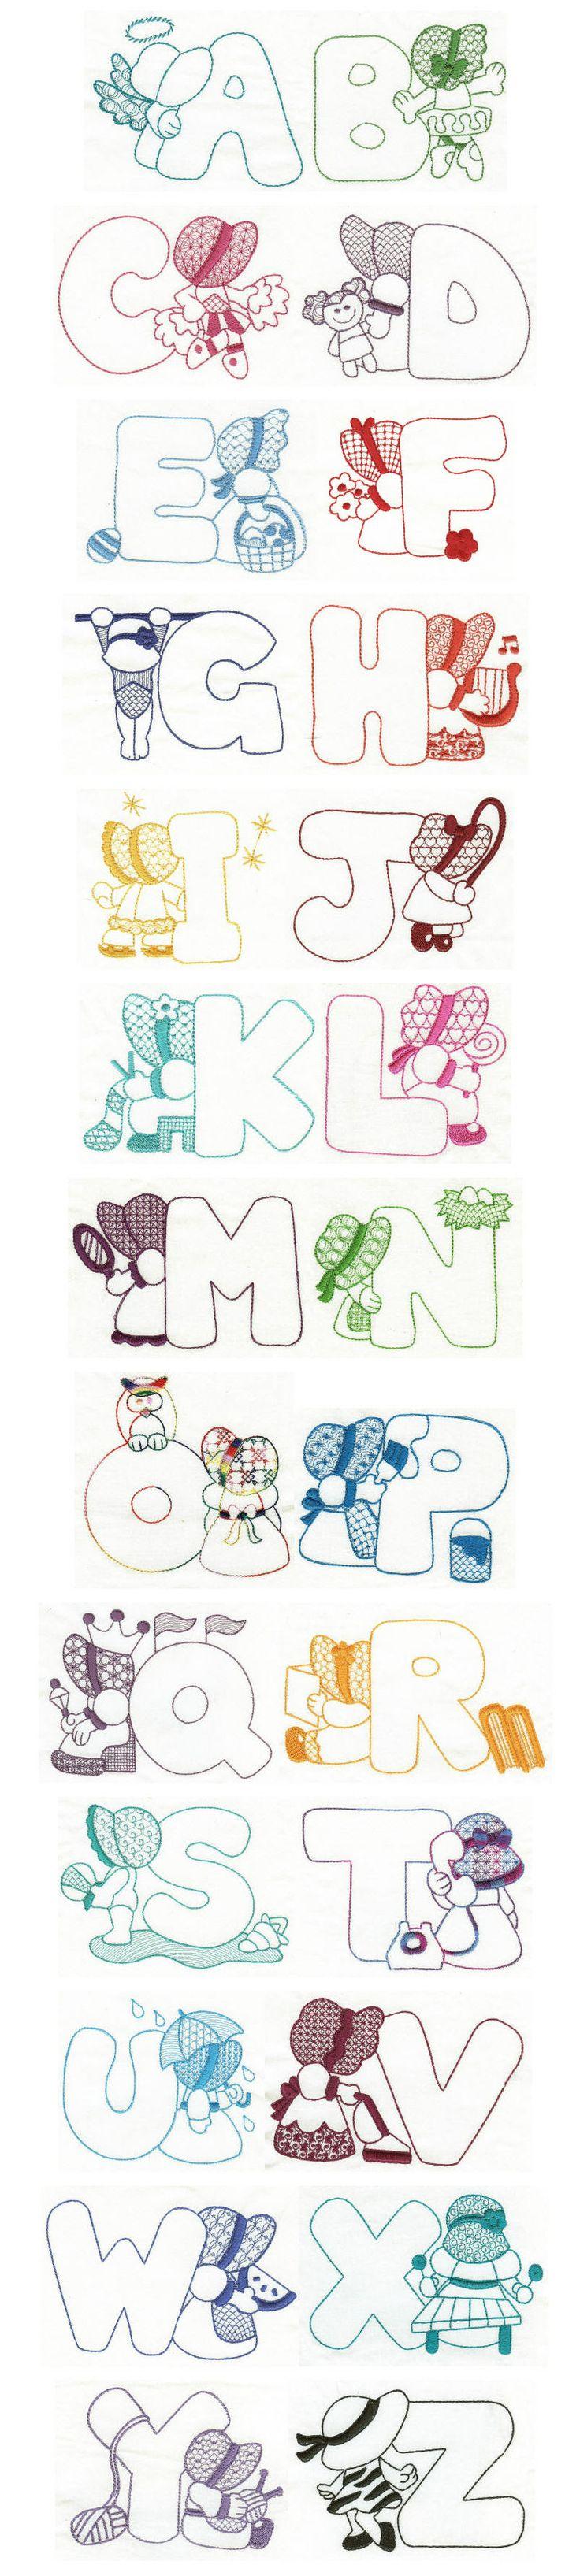 Embroidery | Free machine embroidery designs | Sunbonnet Sue Redwork Alphabet Más